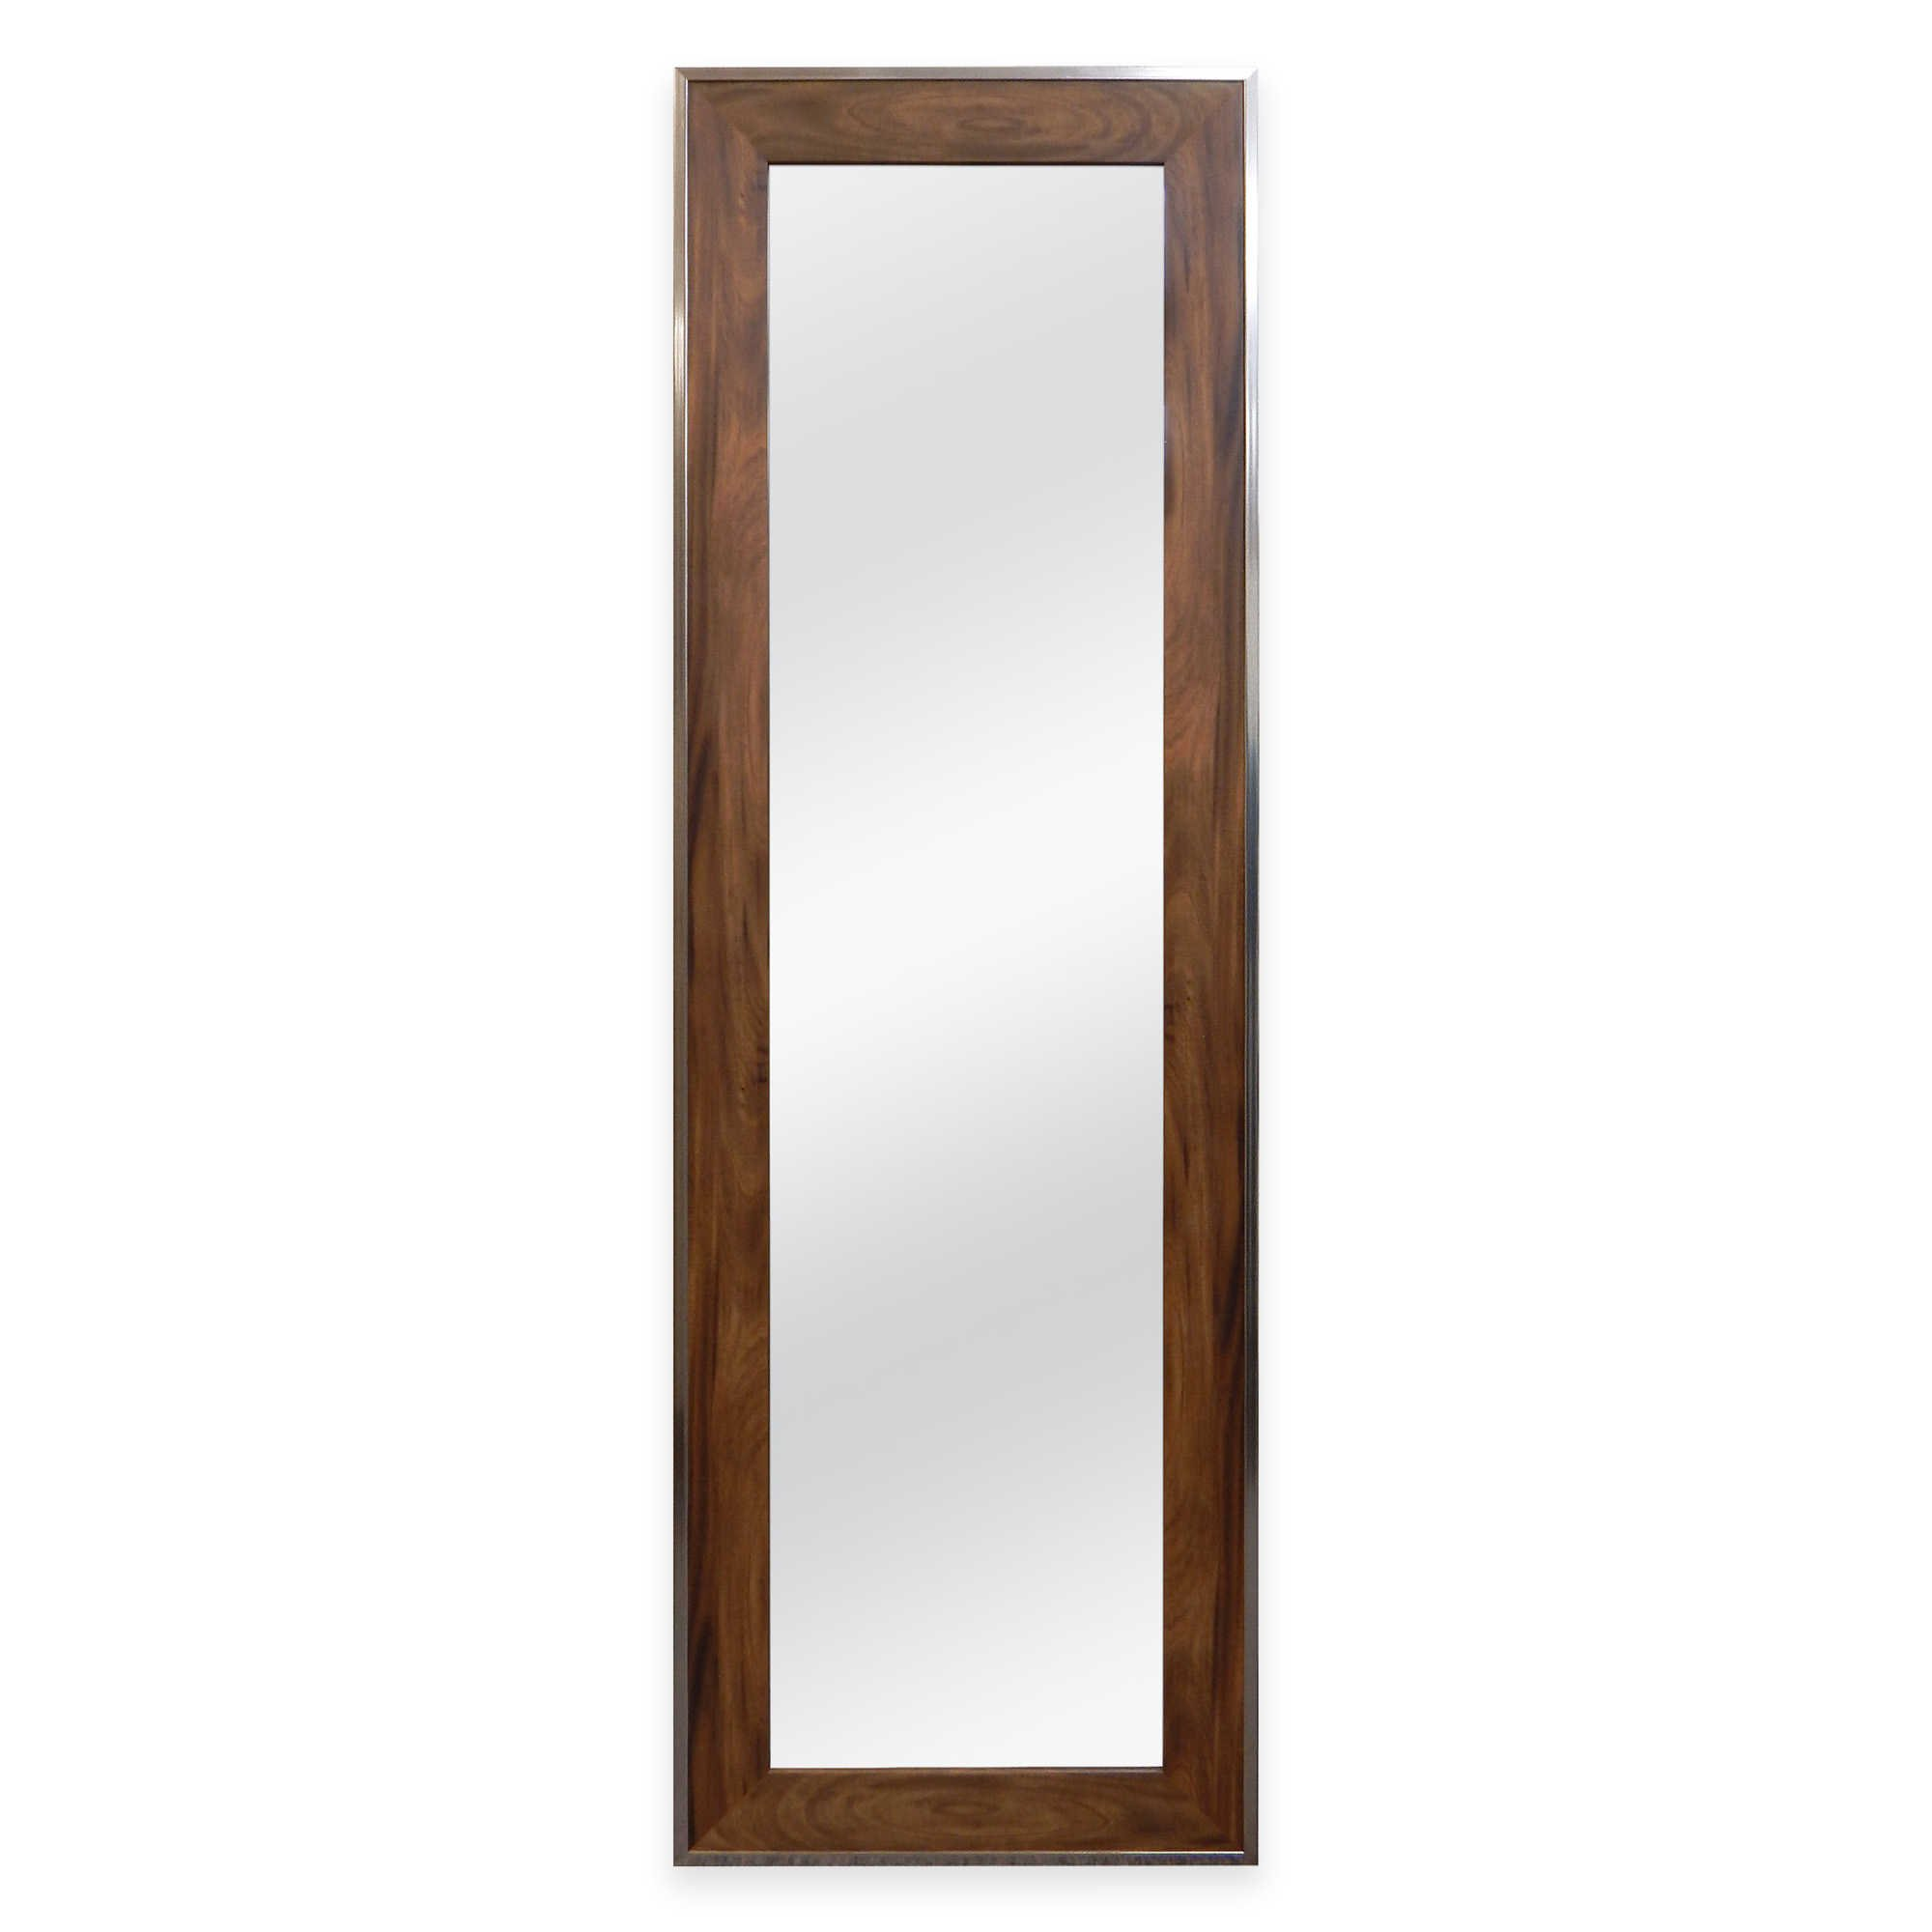 No Tools Over-the-Door 12-Inch x 48-Inch Mirror, Elegant Style in Walnut Woodgrain Finish